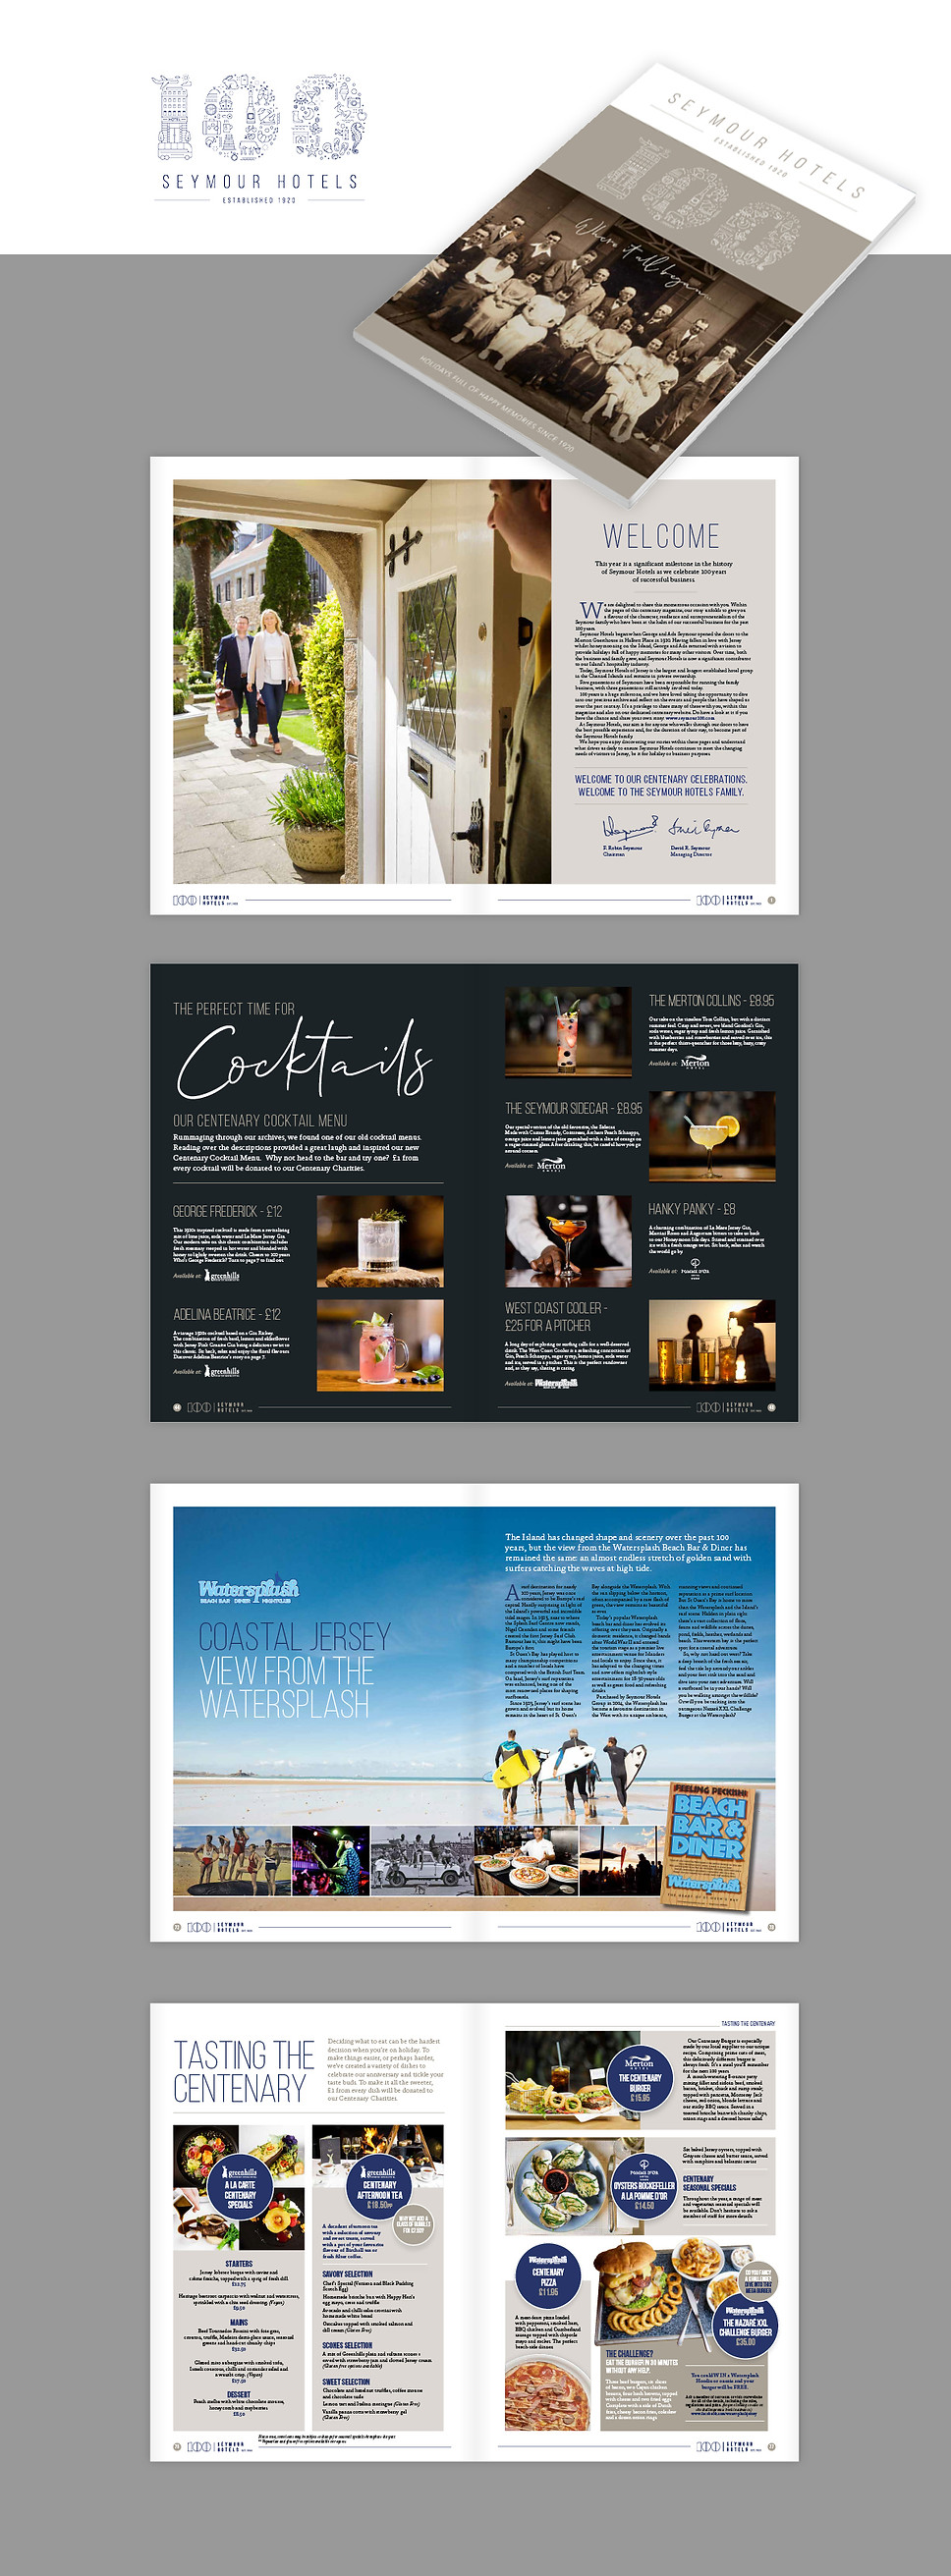 SEY_Portfolio_Complete.jpg